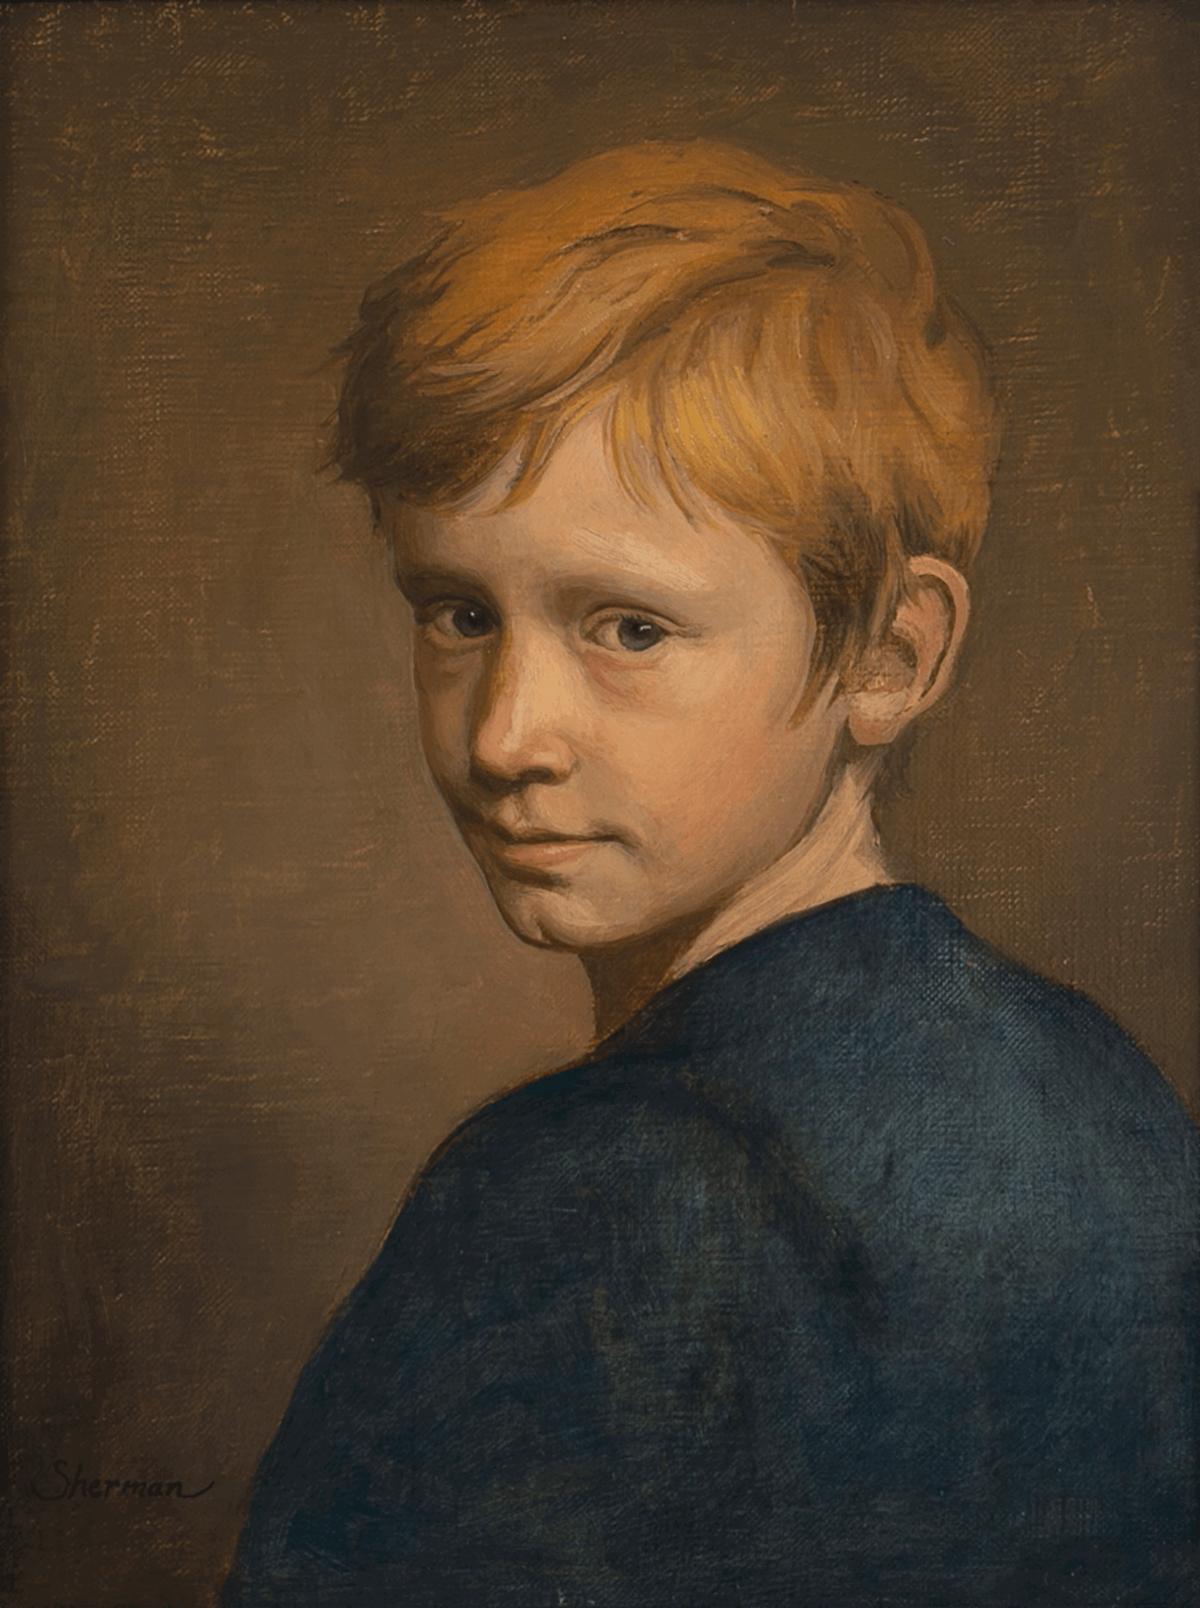 Jonathan Sherman_artist_portrait commission MS web.png